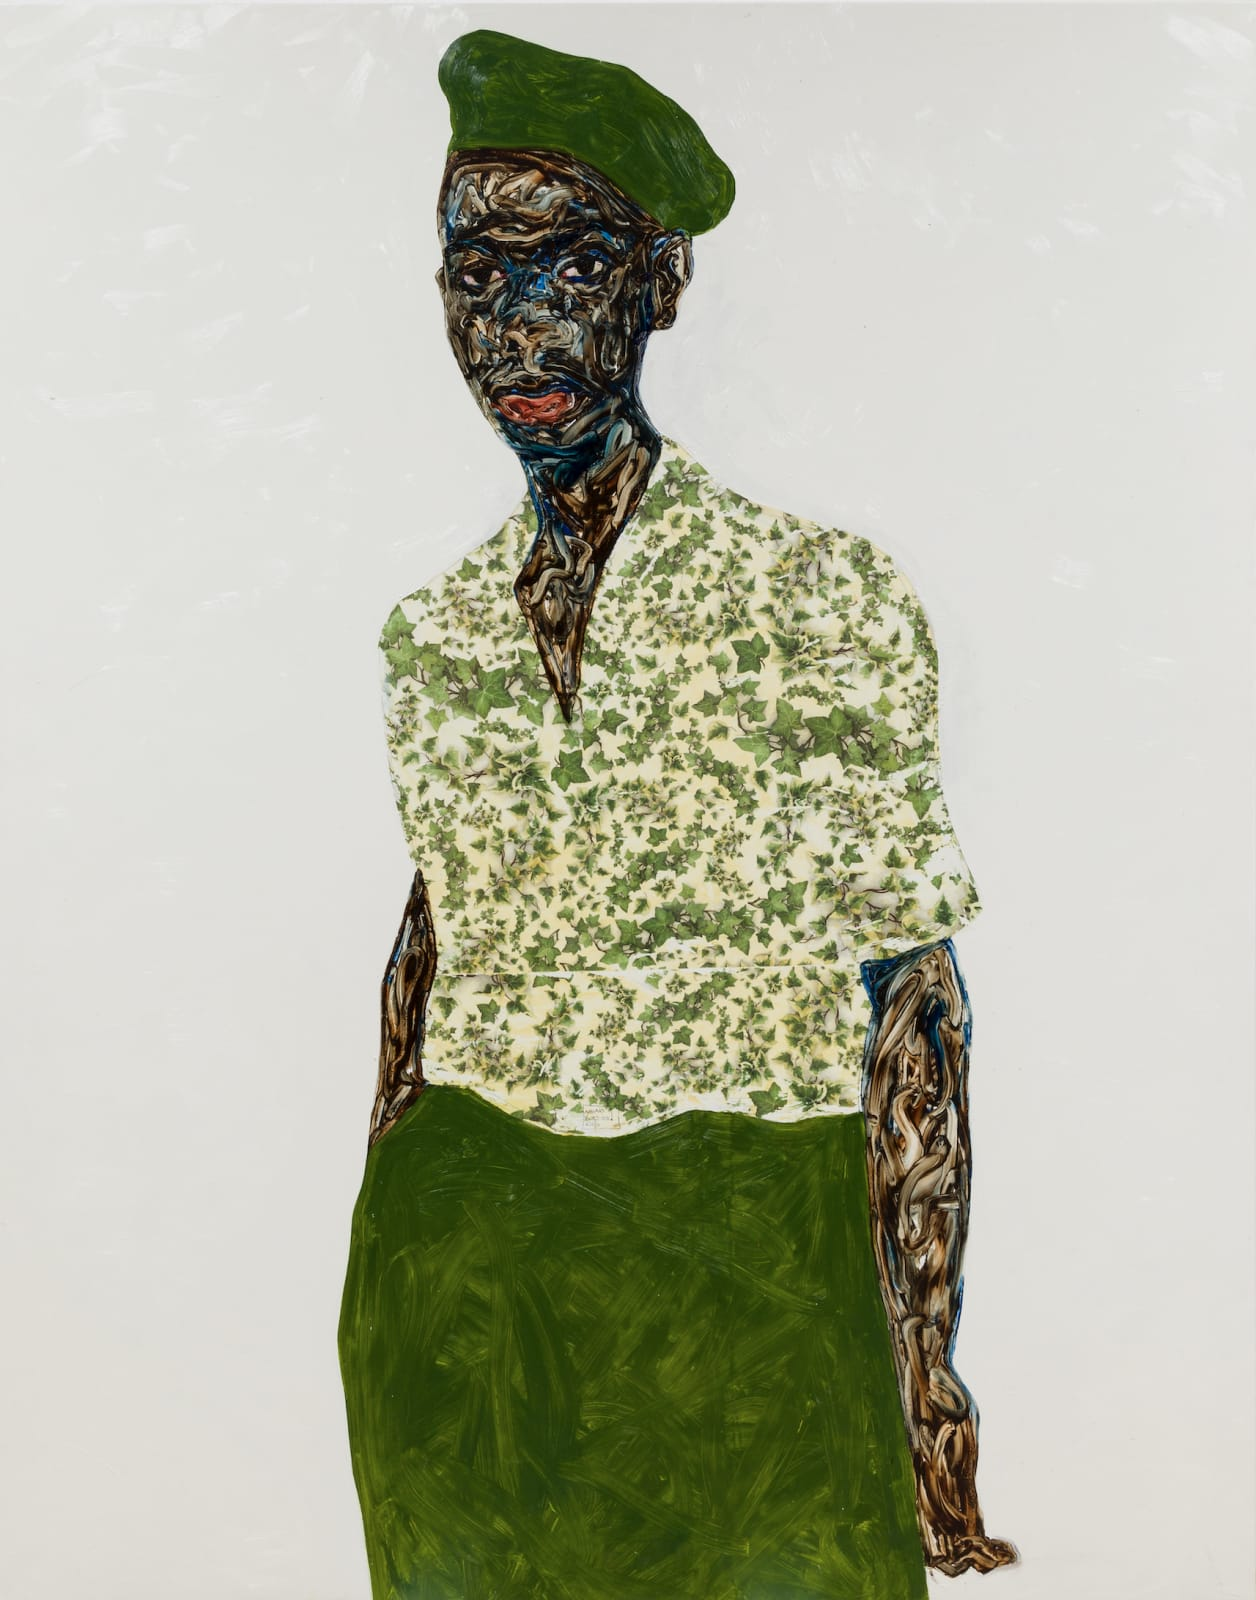 Amoako Boafo, Green beret, 2020